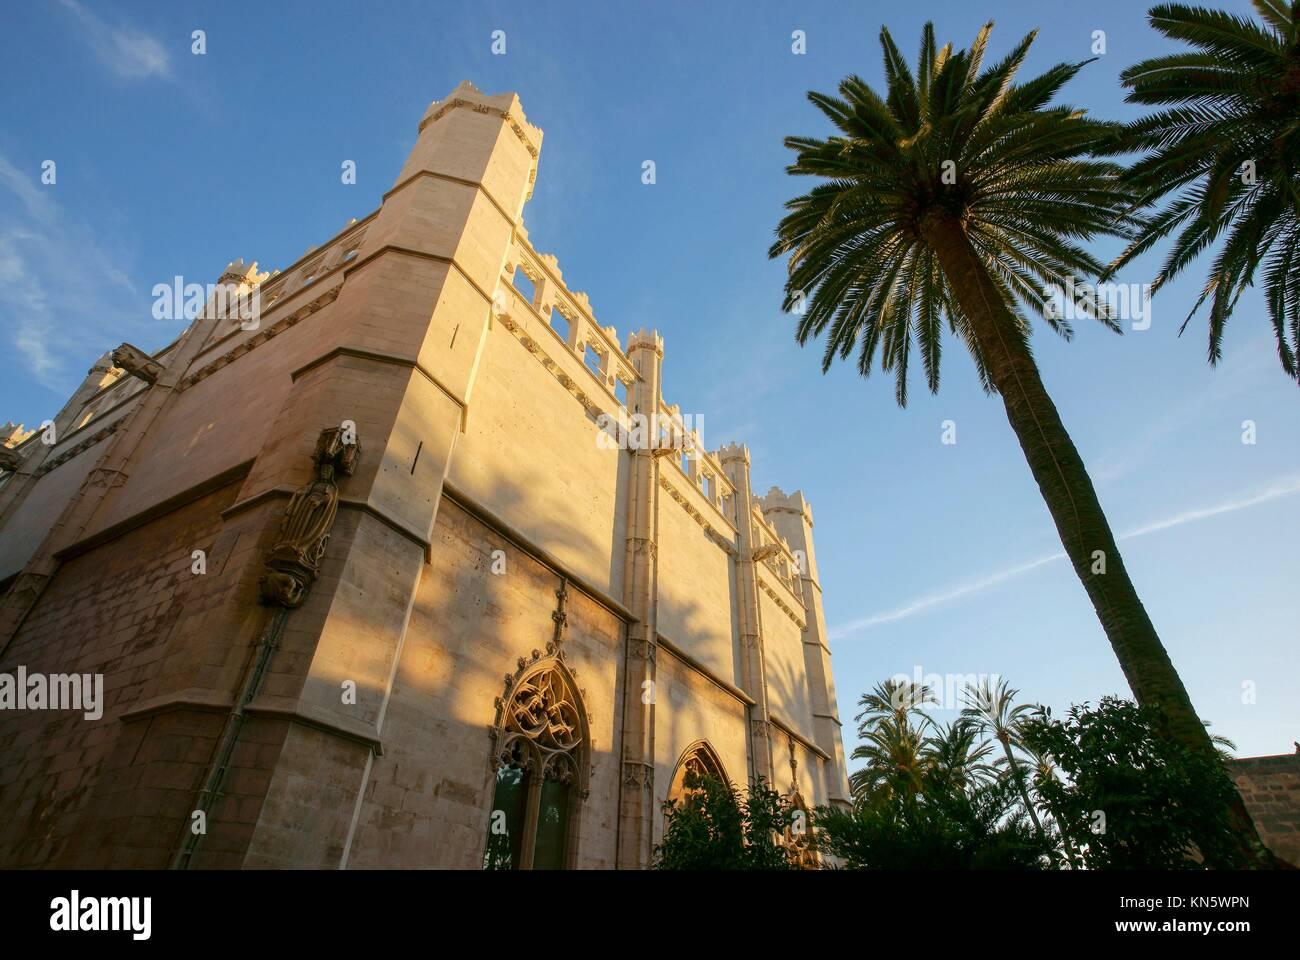 The Llotja, XV century. Palma. Mallorca. Balearic Islands. Spain. Stock Photo